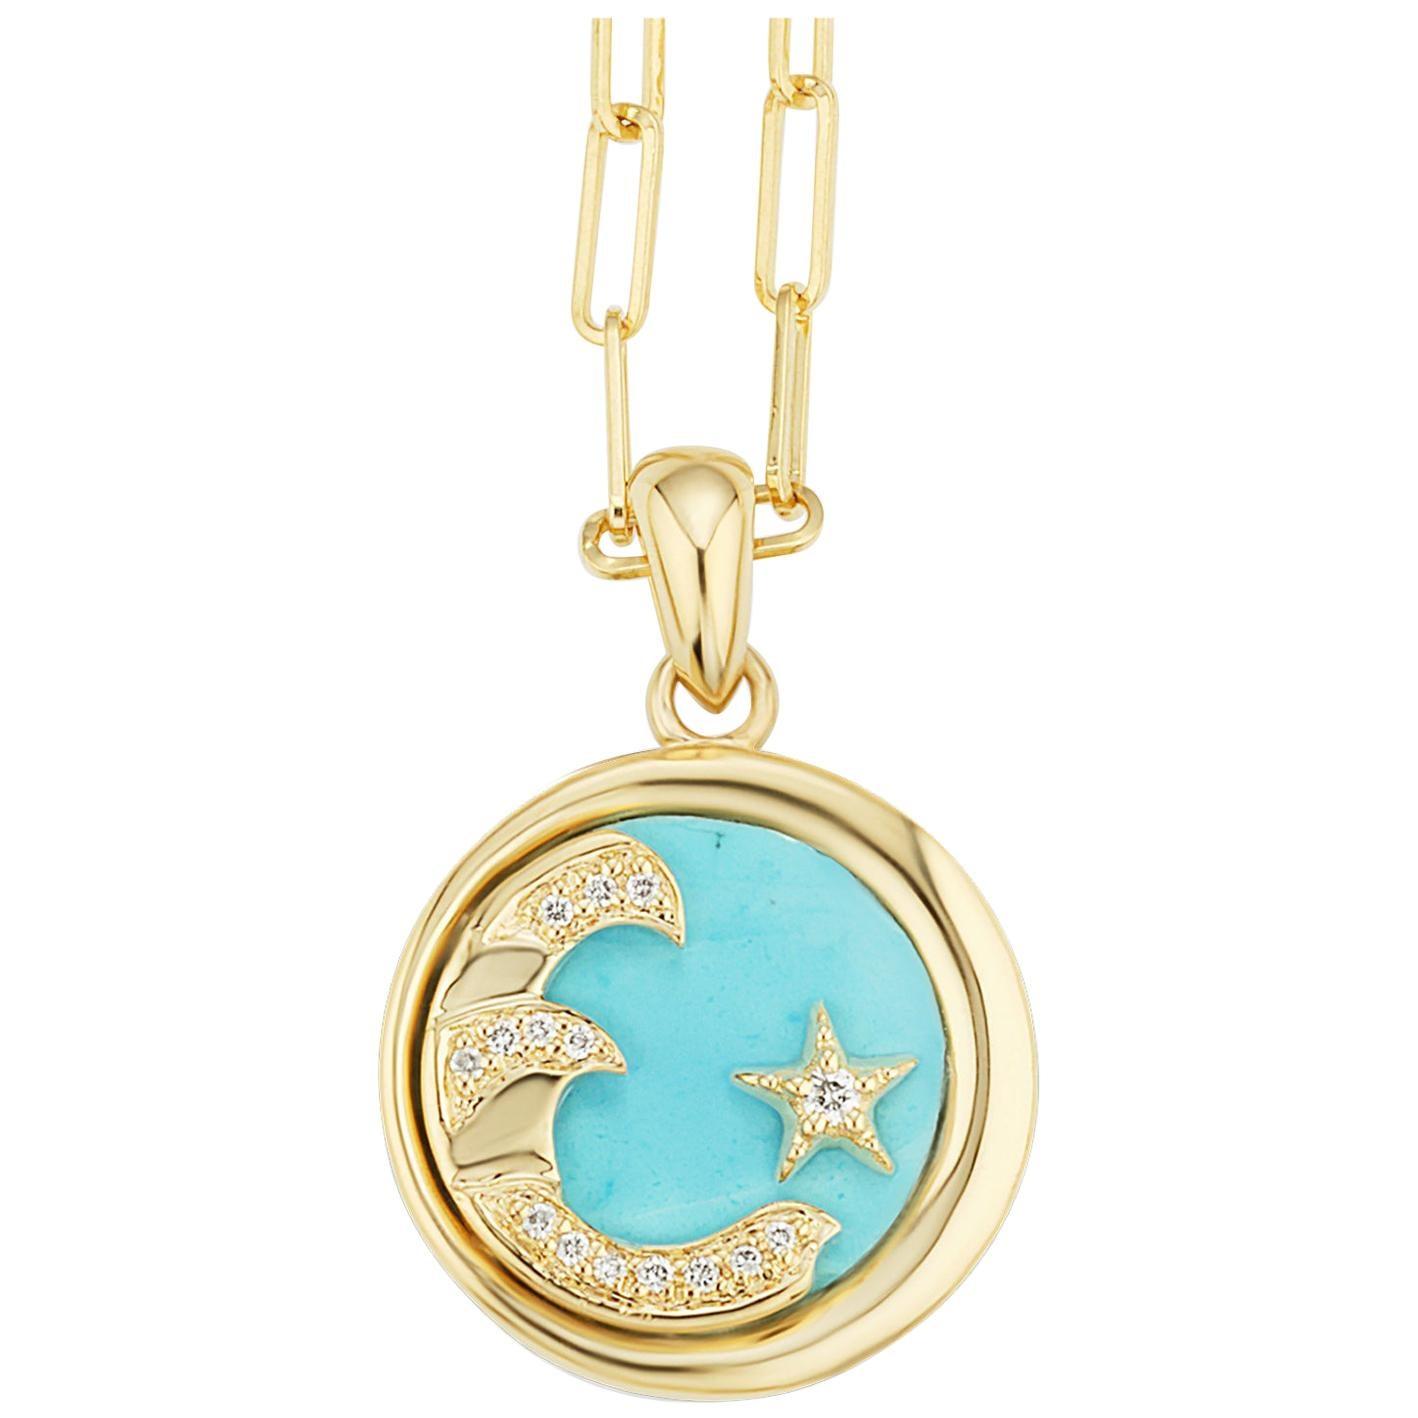 AnaKatarina Elements 'Water' Pendant in 18 Karat Gold, Turquoise, and Diamonds